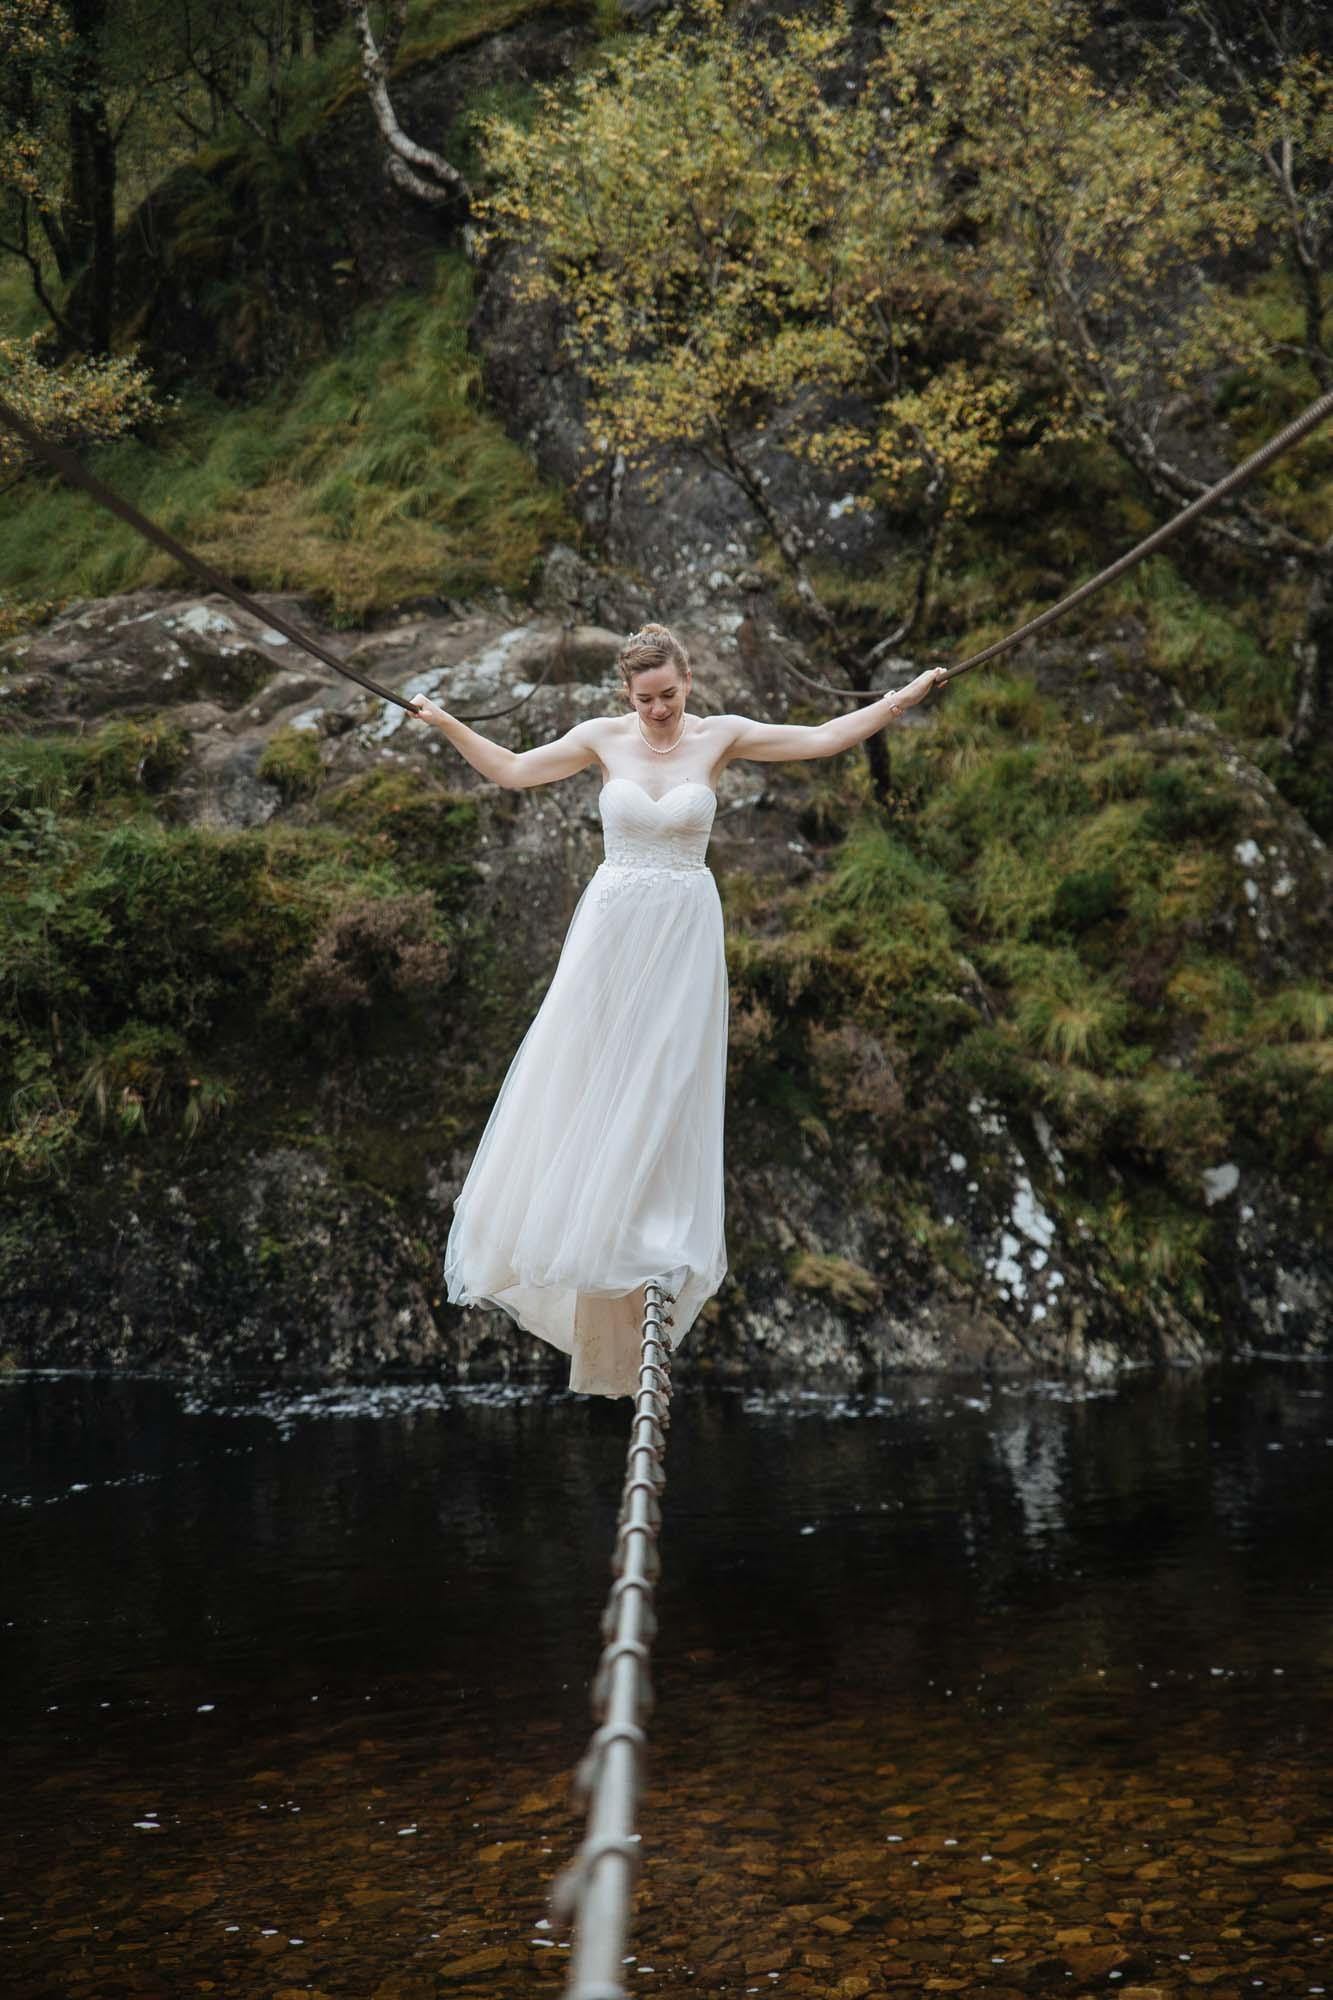 Bride on Rope Bridge